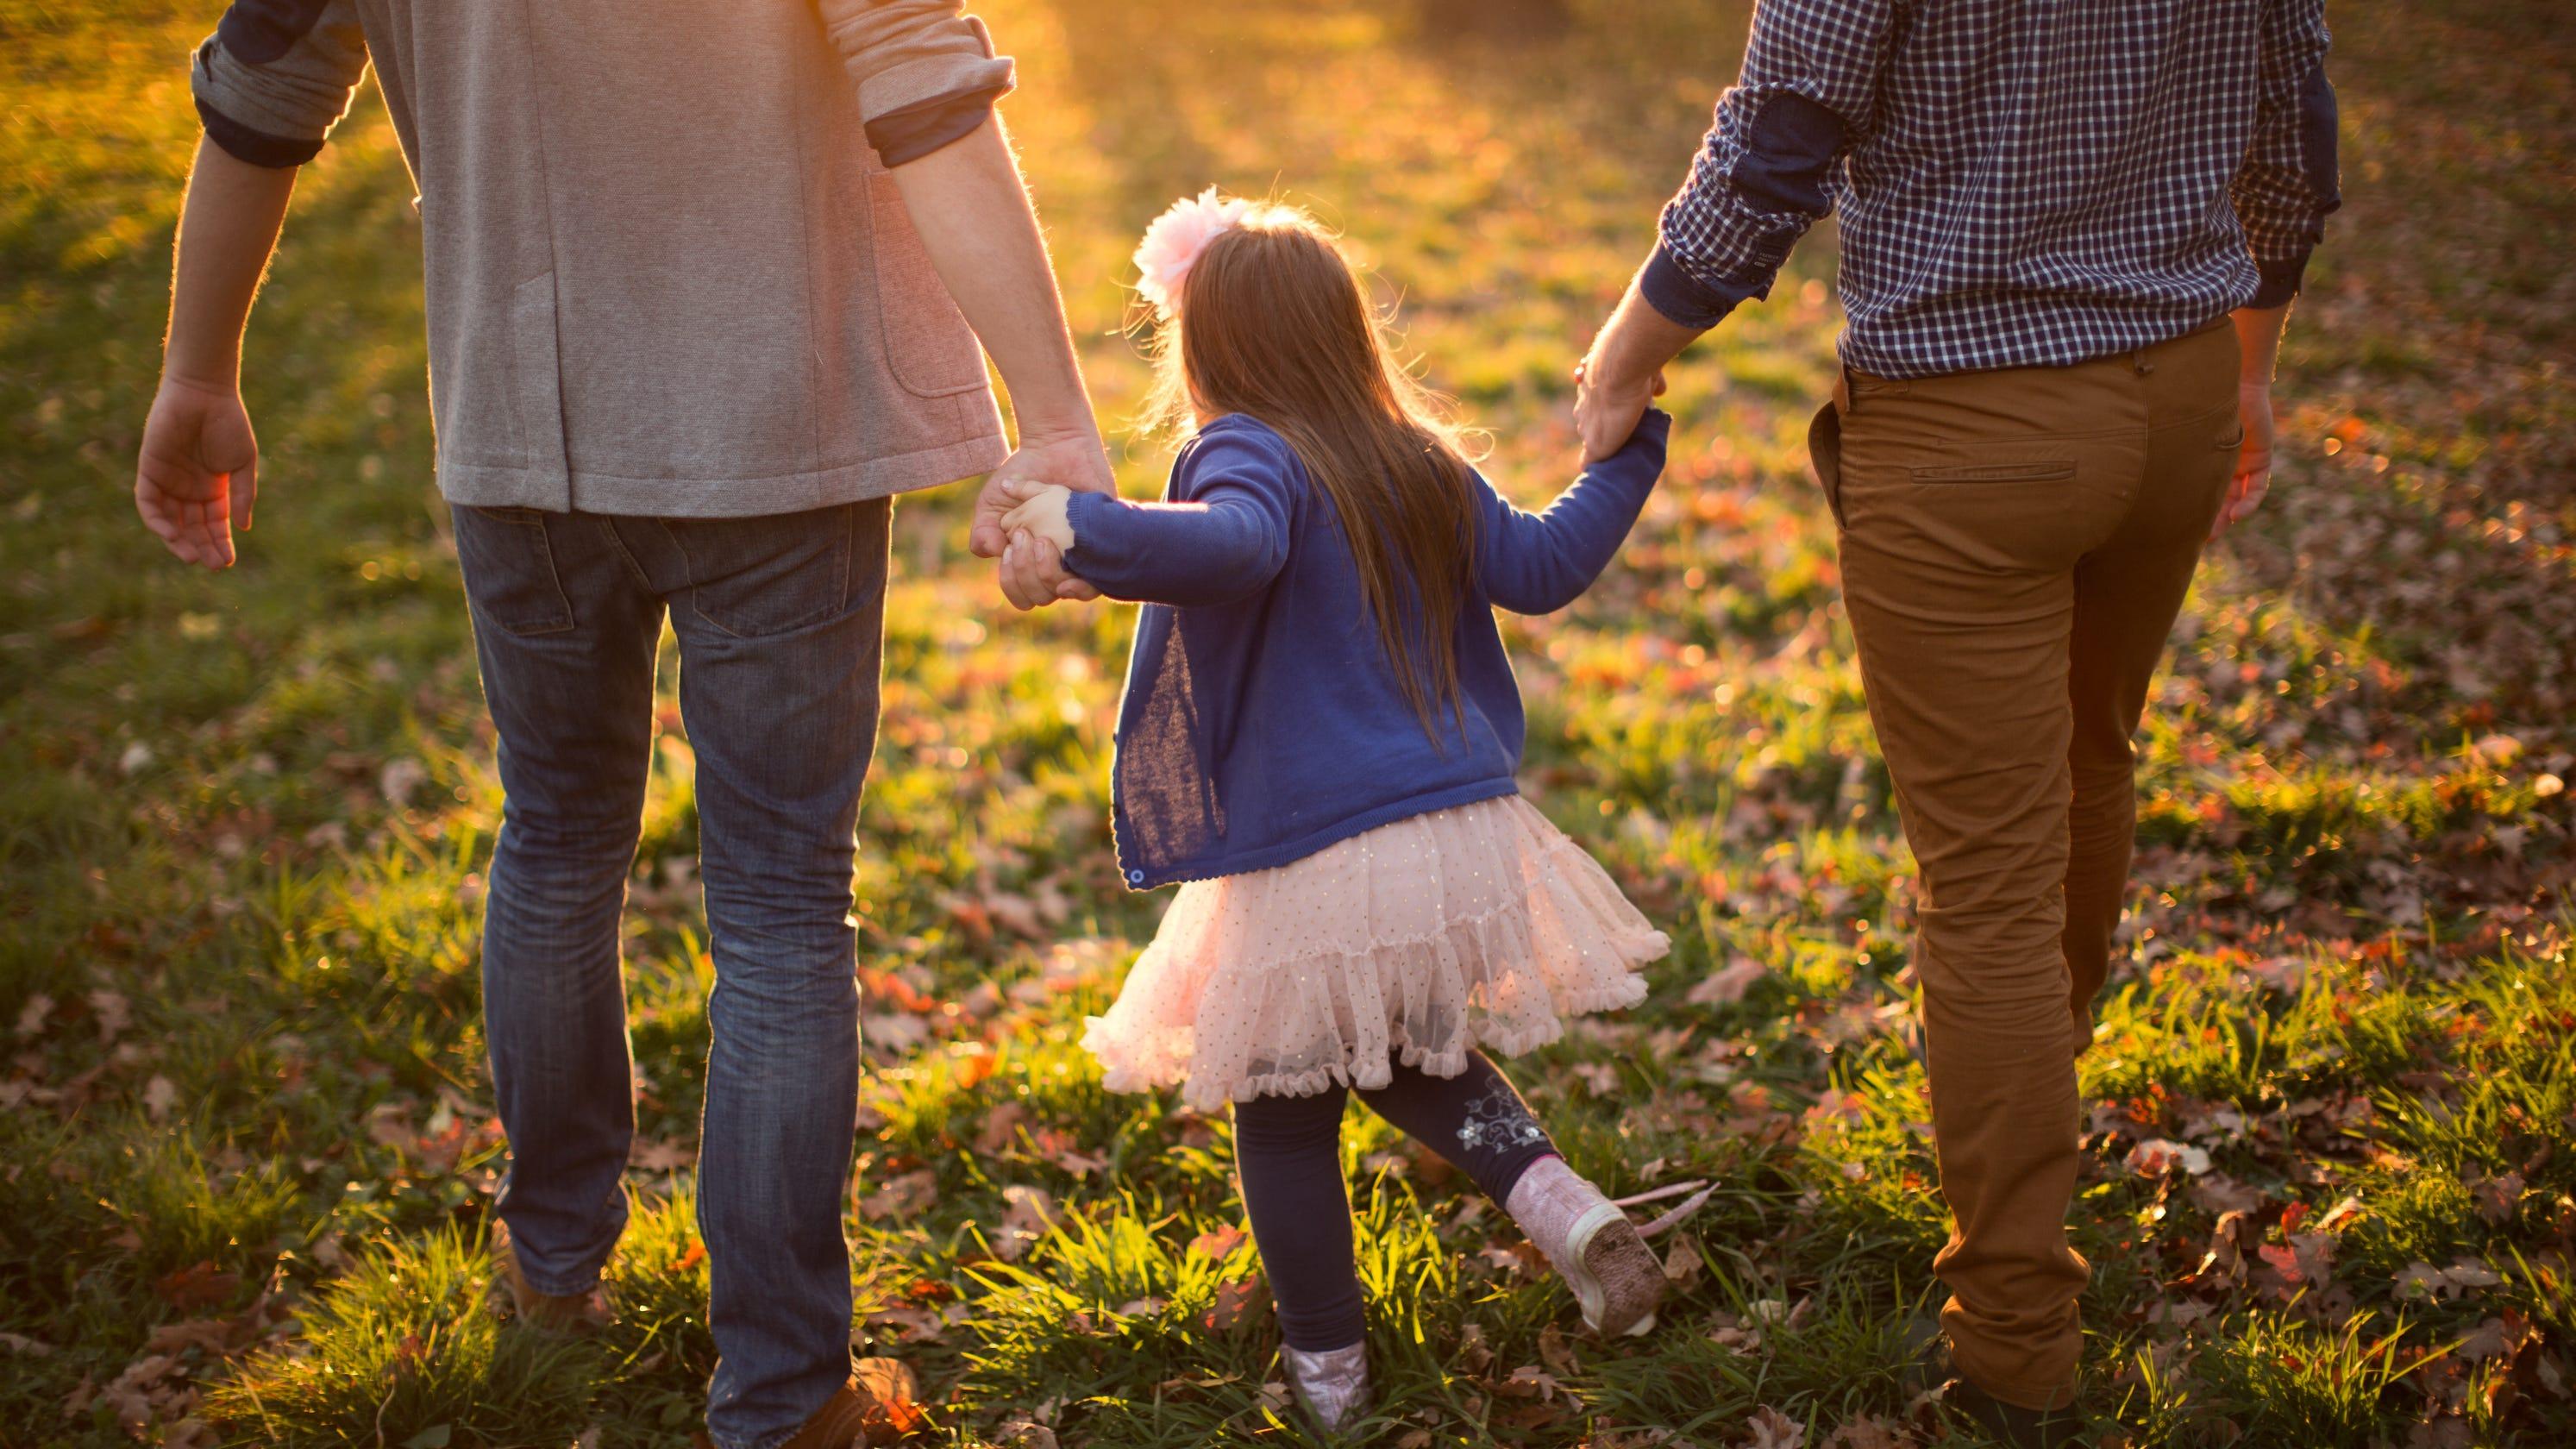 Michigan will no longer fund adoption agencies that discriminate against LGBTQ parents